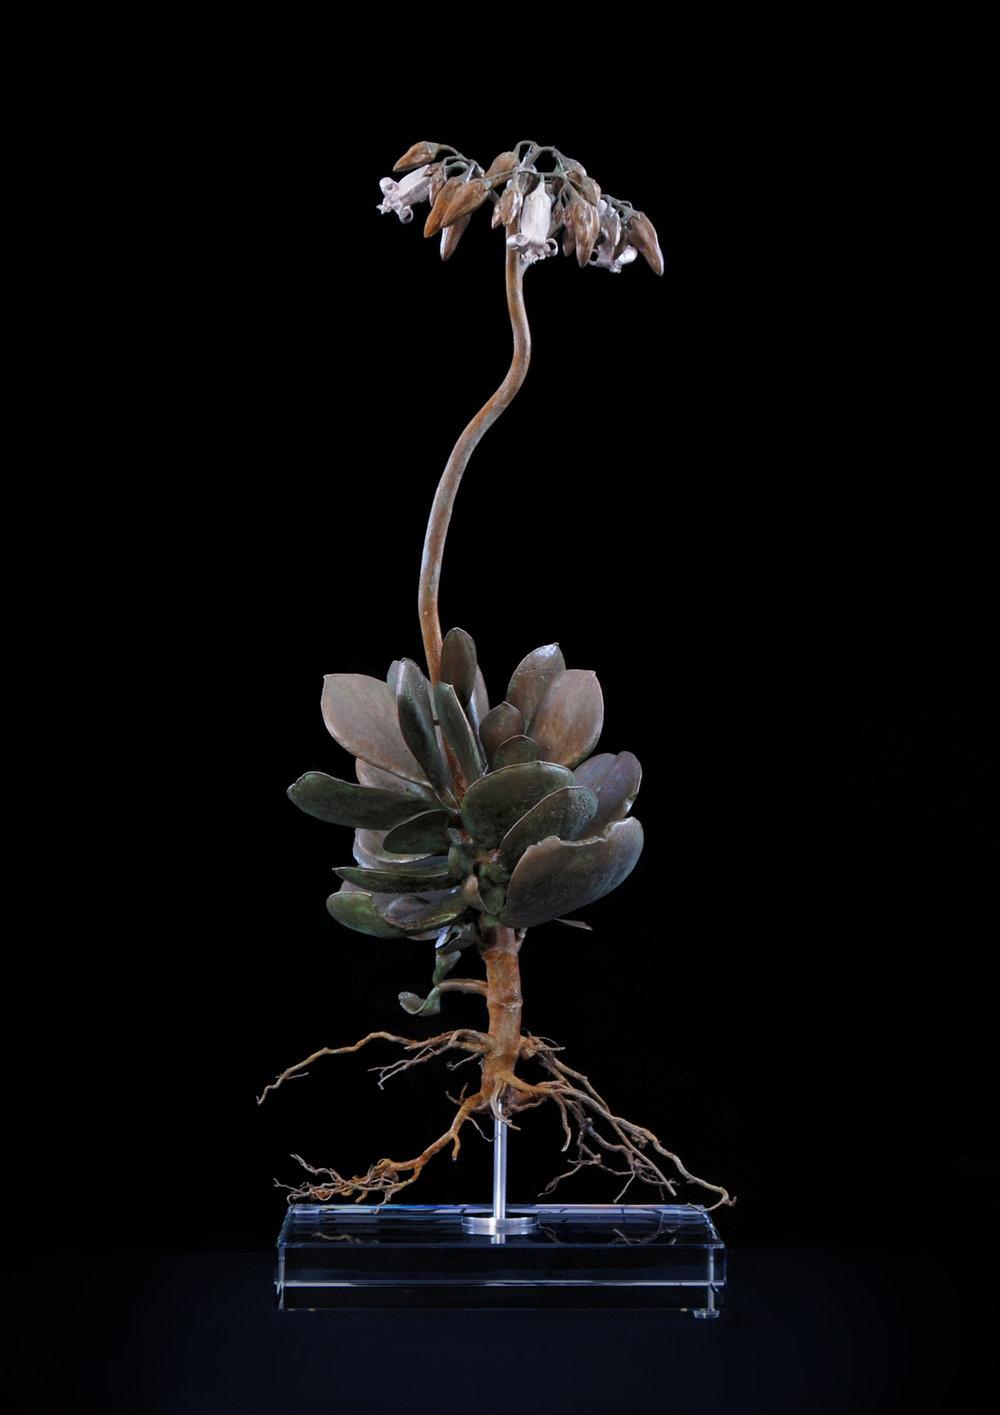 <i>Cotyledon orbiculata</i>